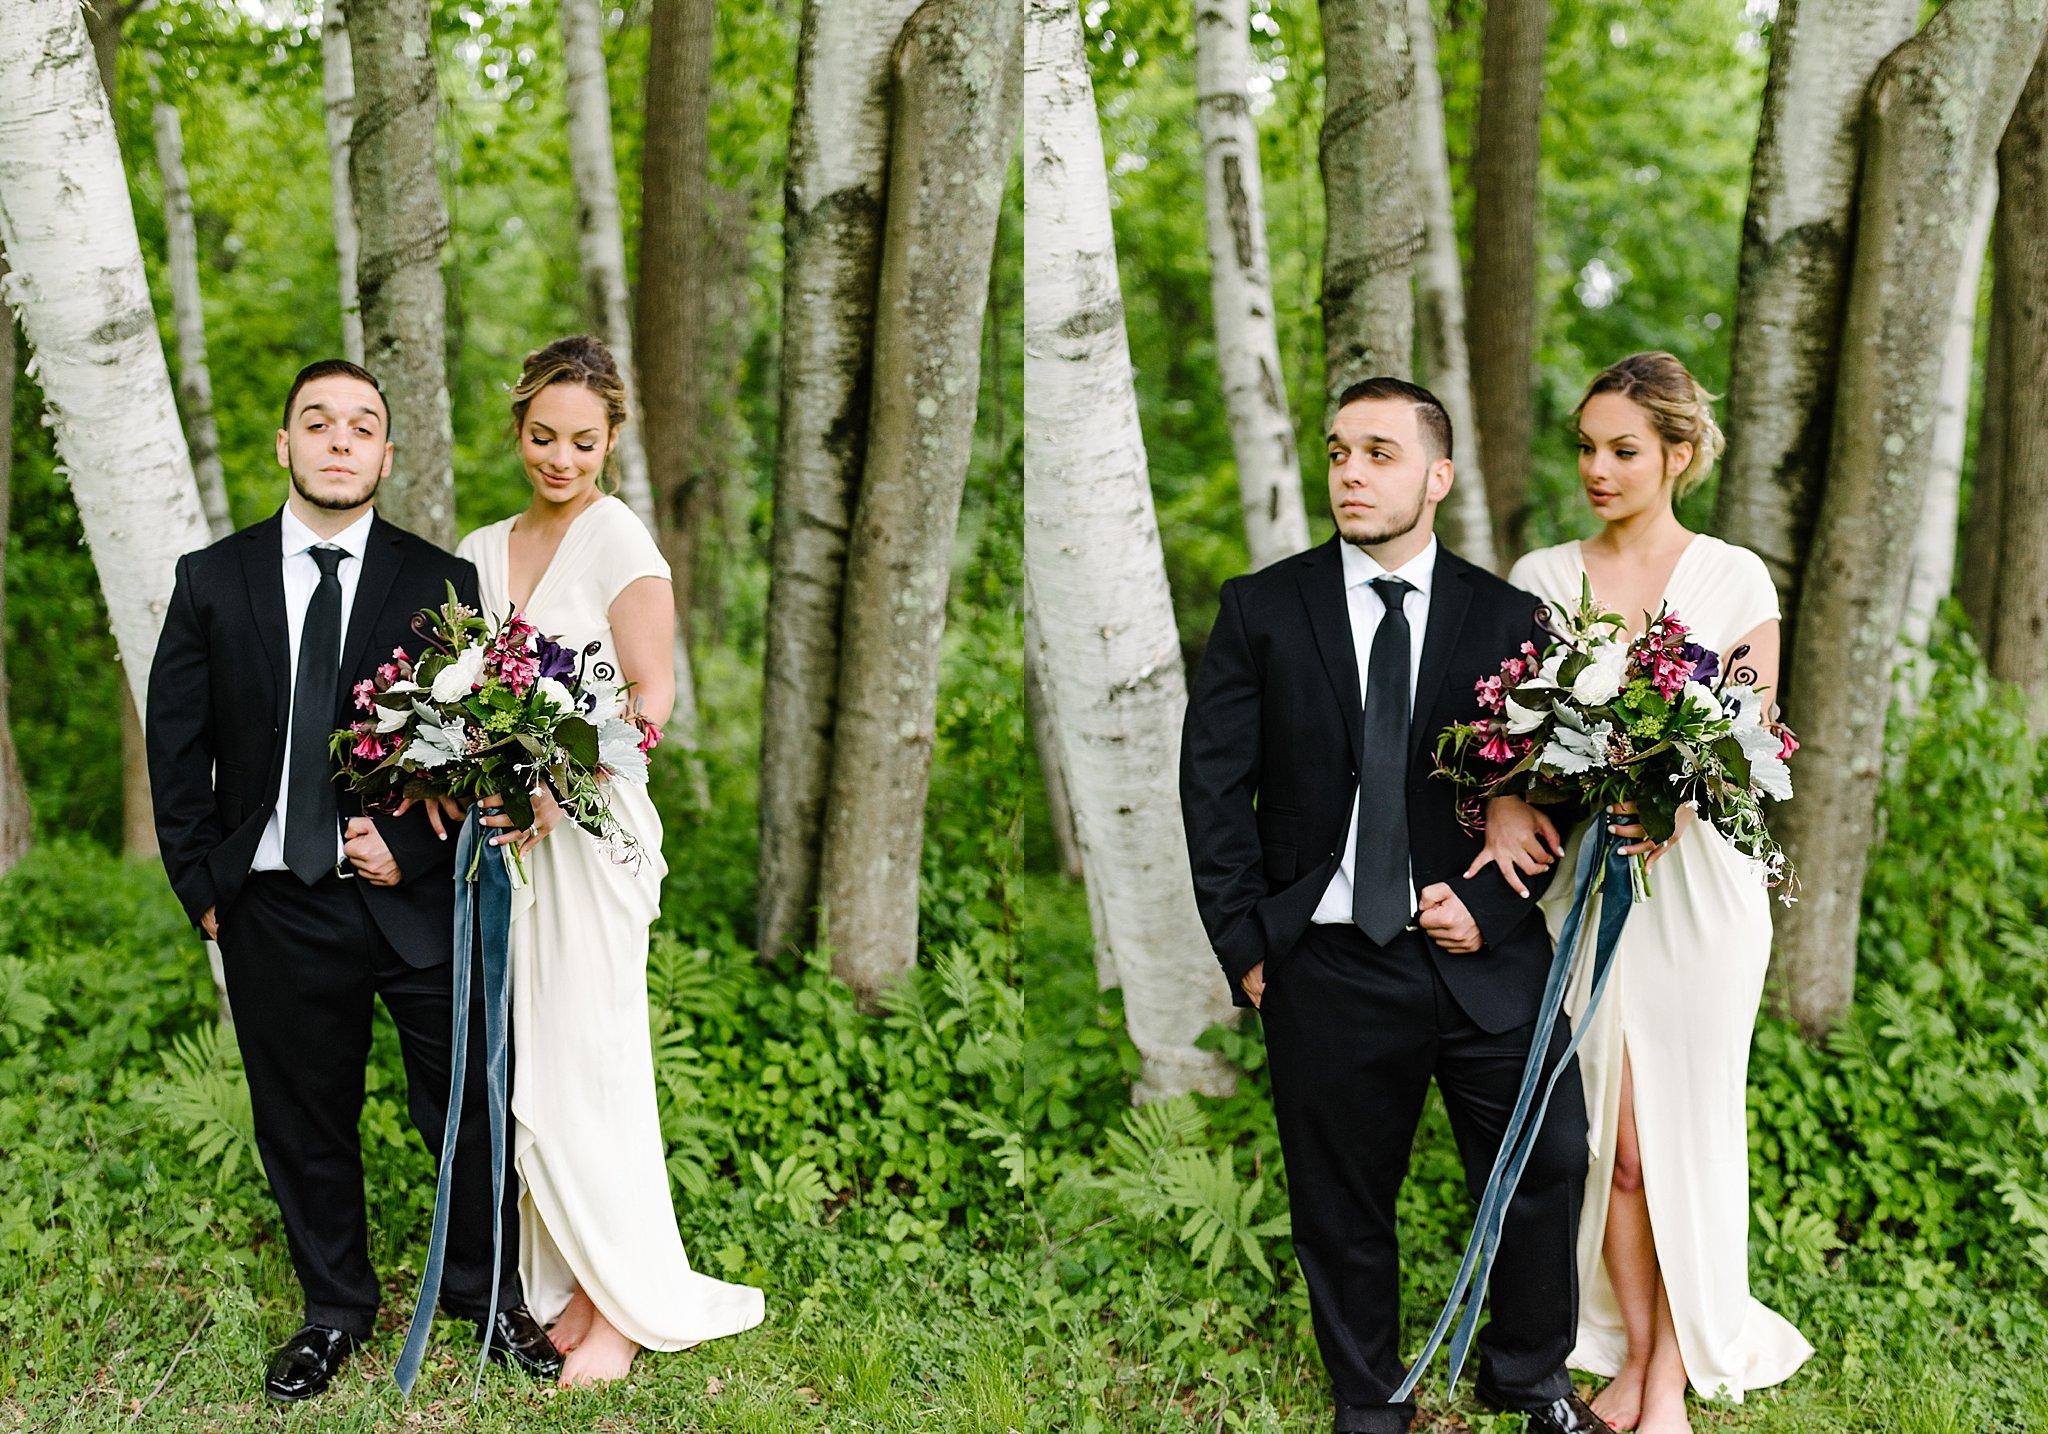 new england wedding photographer_5.jpg